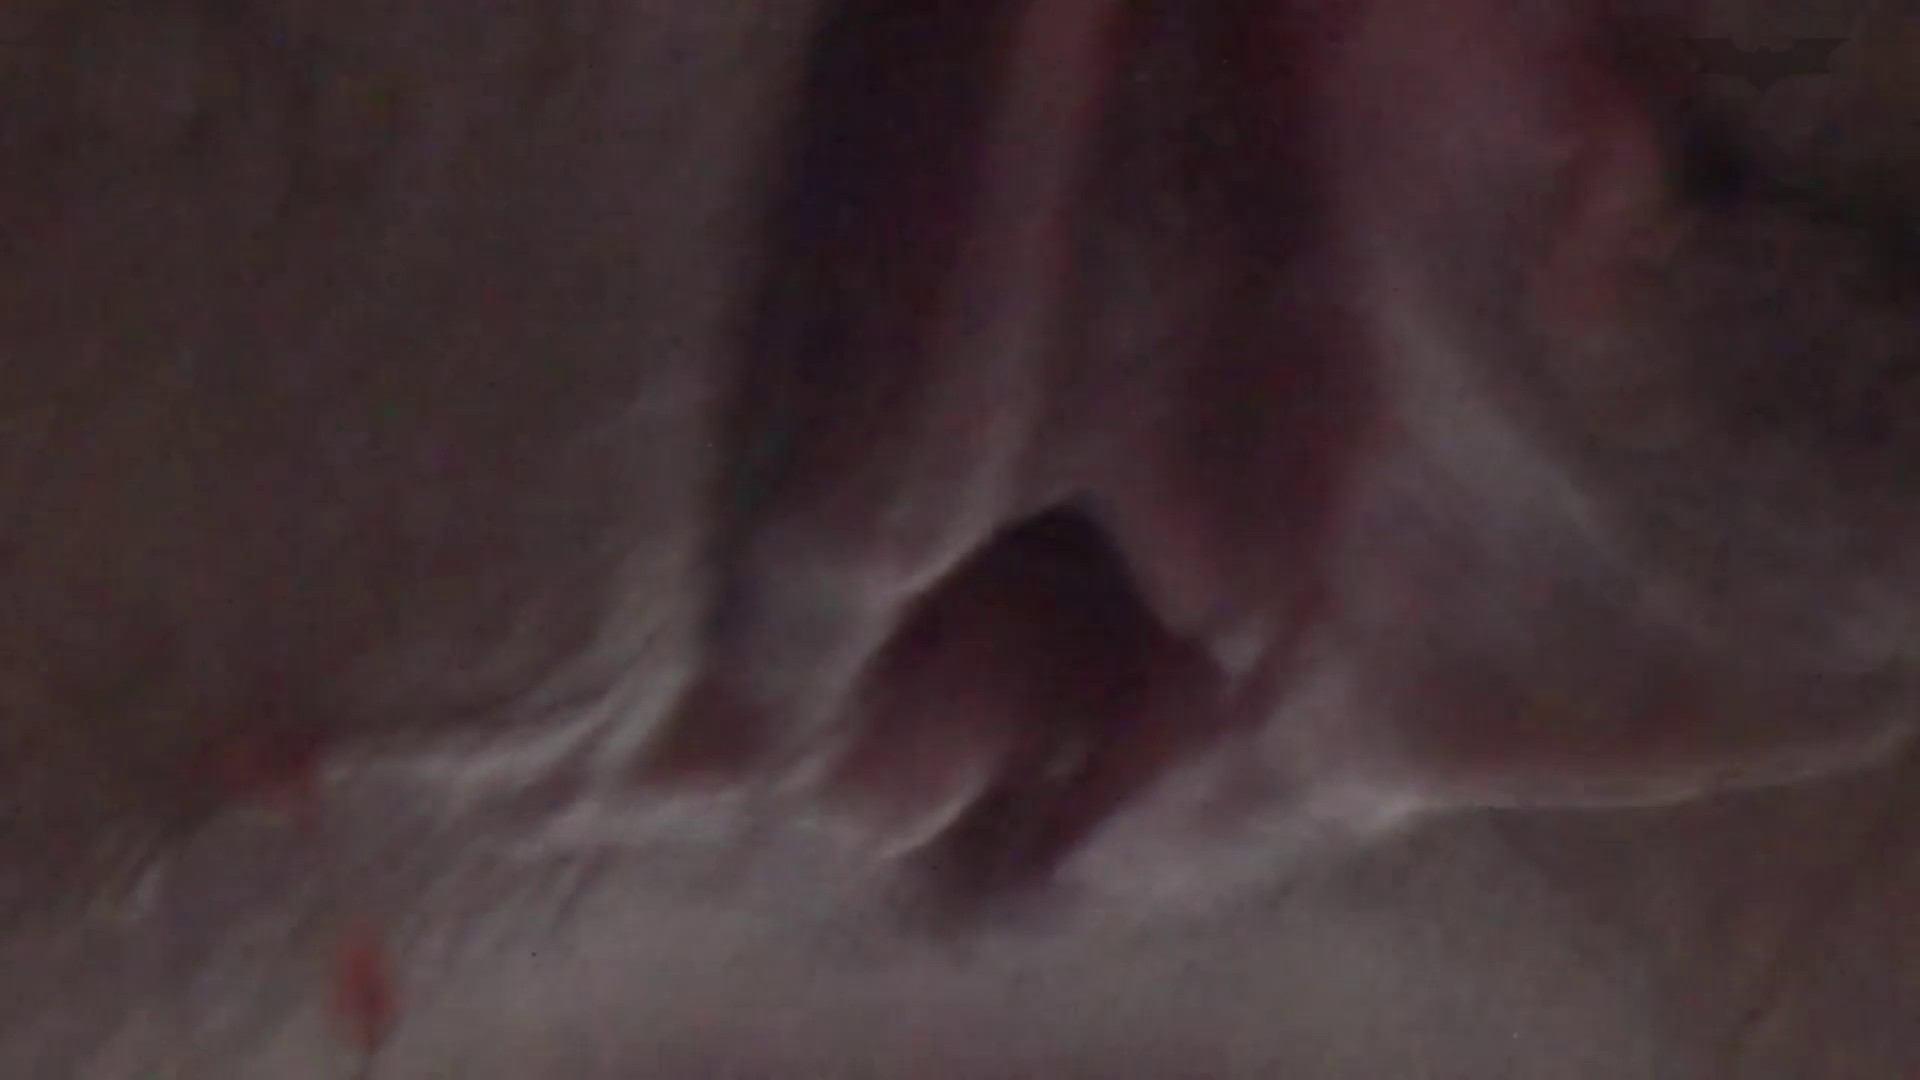 JD盗撮 美女の洗面所の秘密 Vol.42 OLの実態  49pic 5